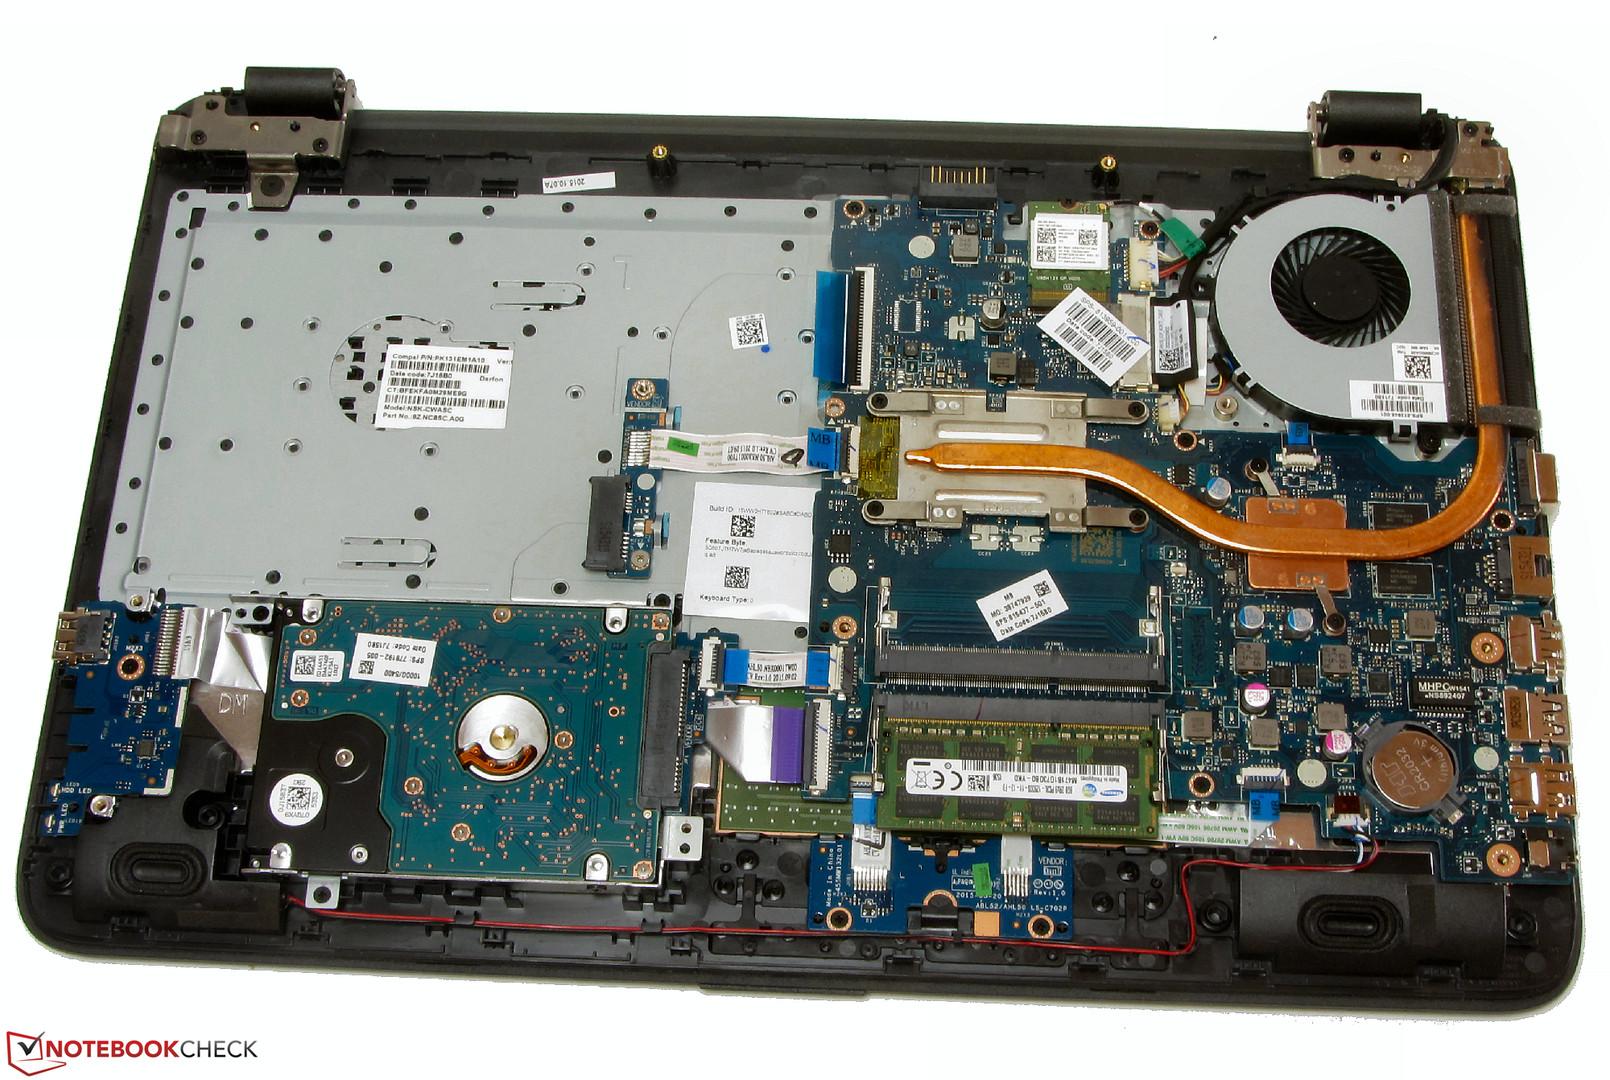 25000 2 Laptop Baru Hp Probook 440 G4 I5 7200u Layar 140inch Led Windows 10 Pro Ixbtcom